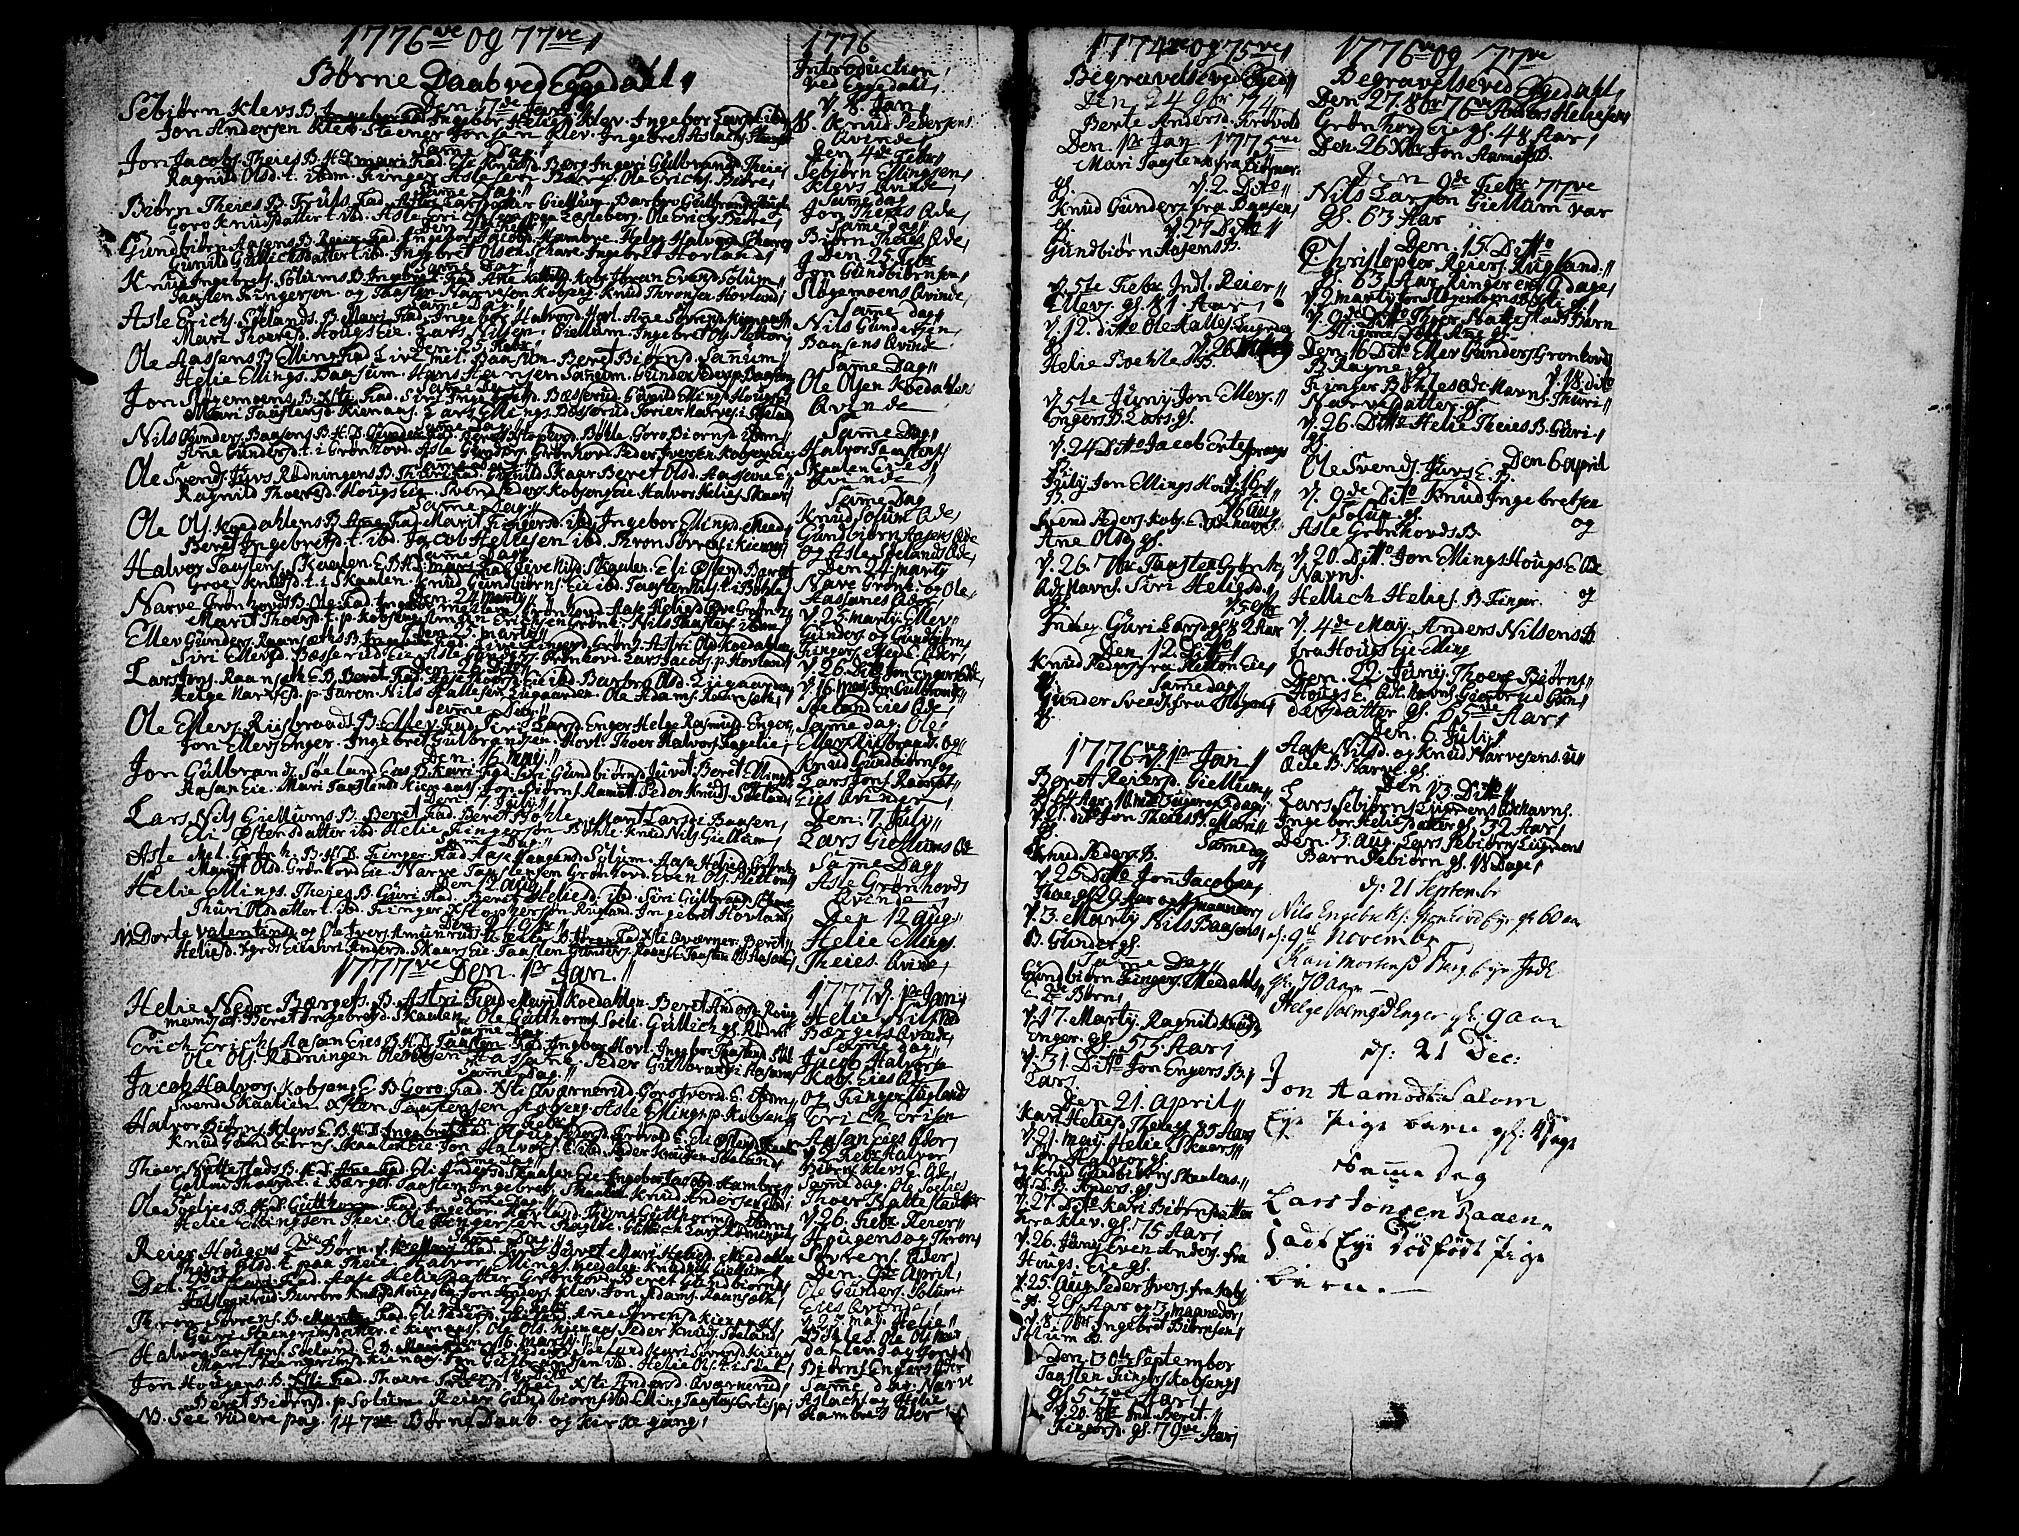 SAKO, Sigdal kirkebøker, F/Fa/L0001: Parish register (official) no. I 1, 1722-1777, p. 141-142